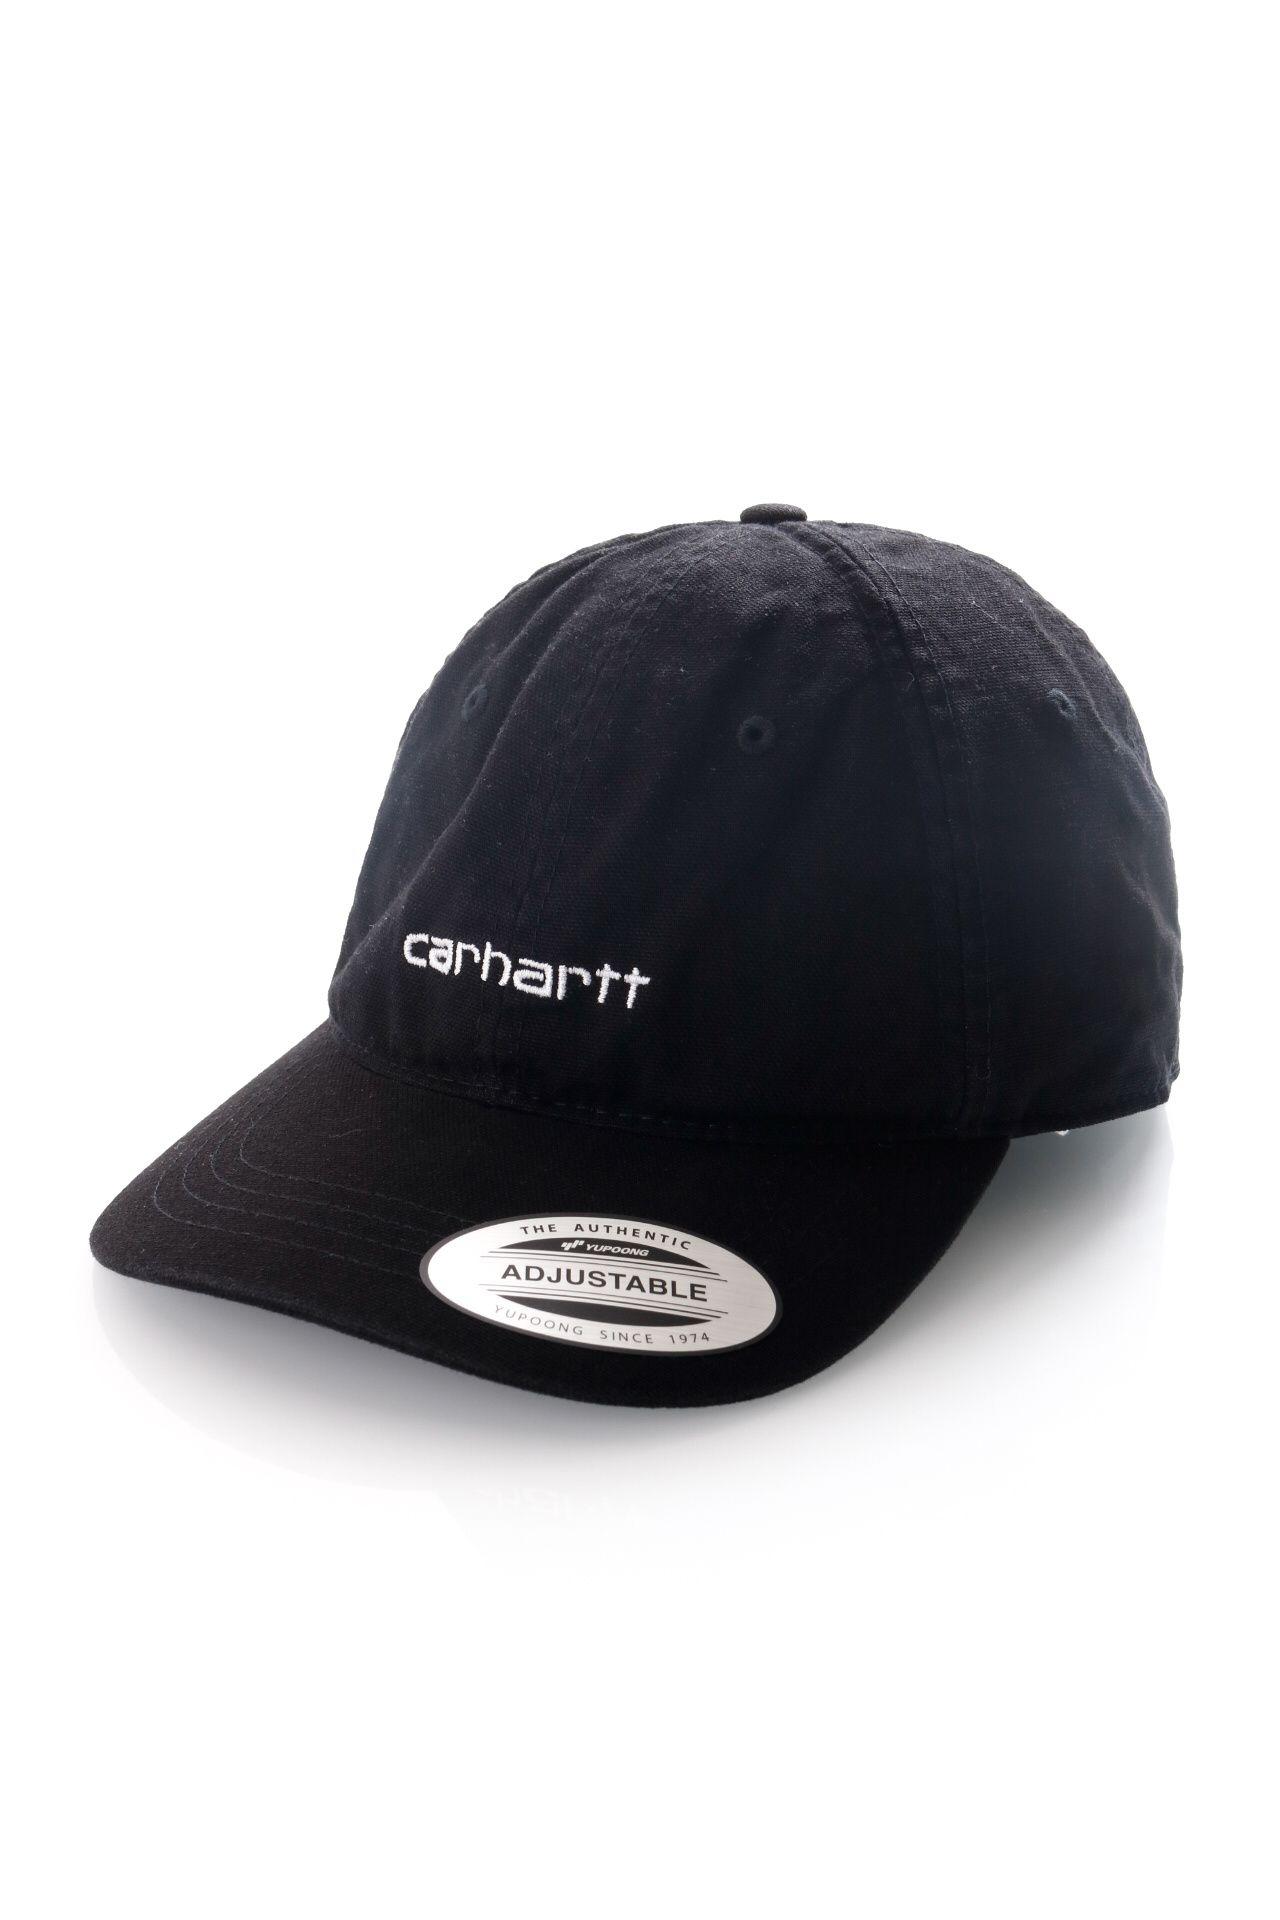 Afbeelding van Carhartt Dad Cap Canvas Coach Cap Black / White I028165